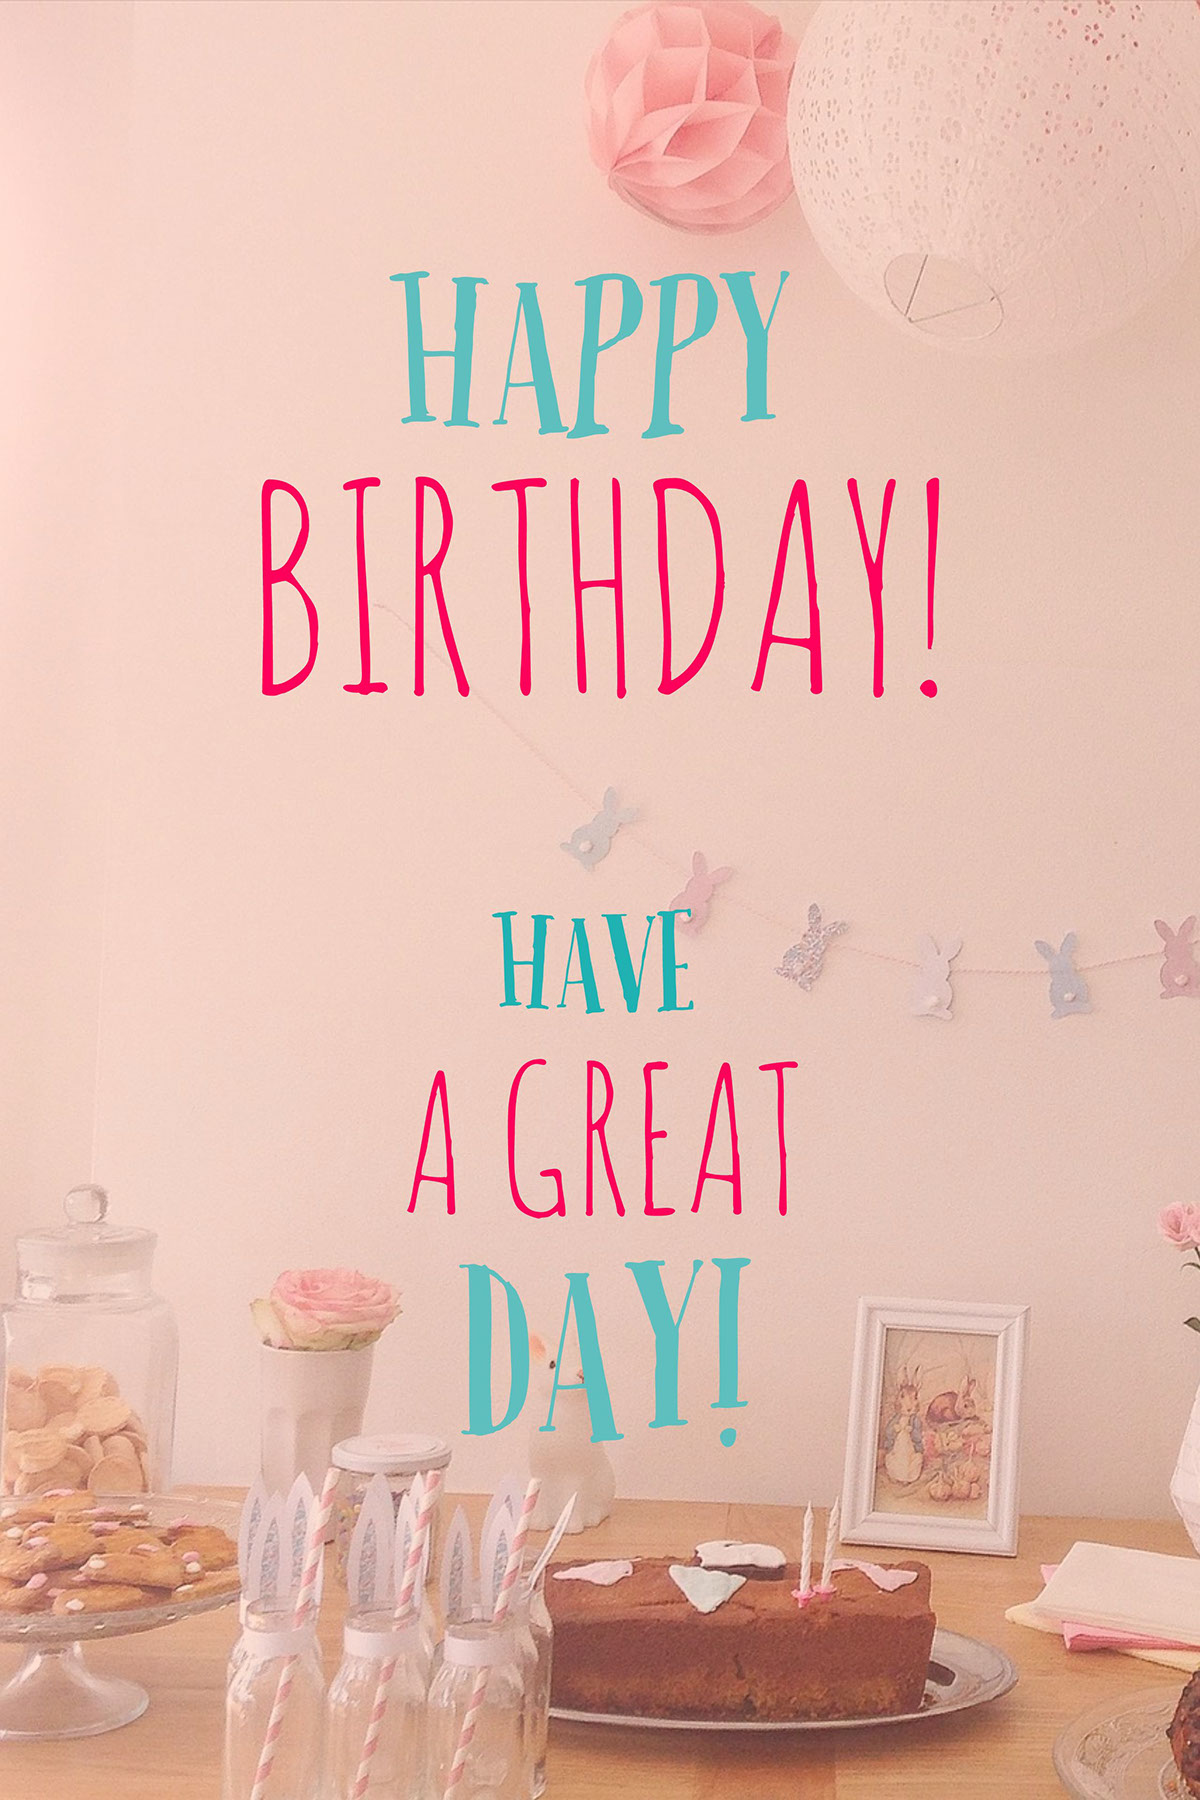 Birthday! Birthday! Happy Day! great Have a a great Happy Birthday!